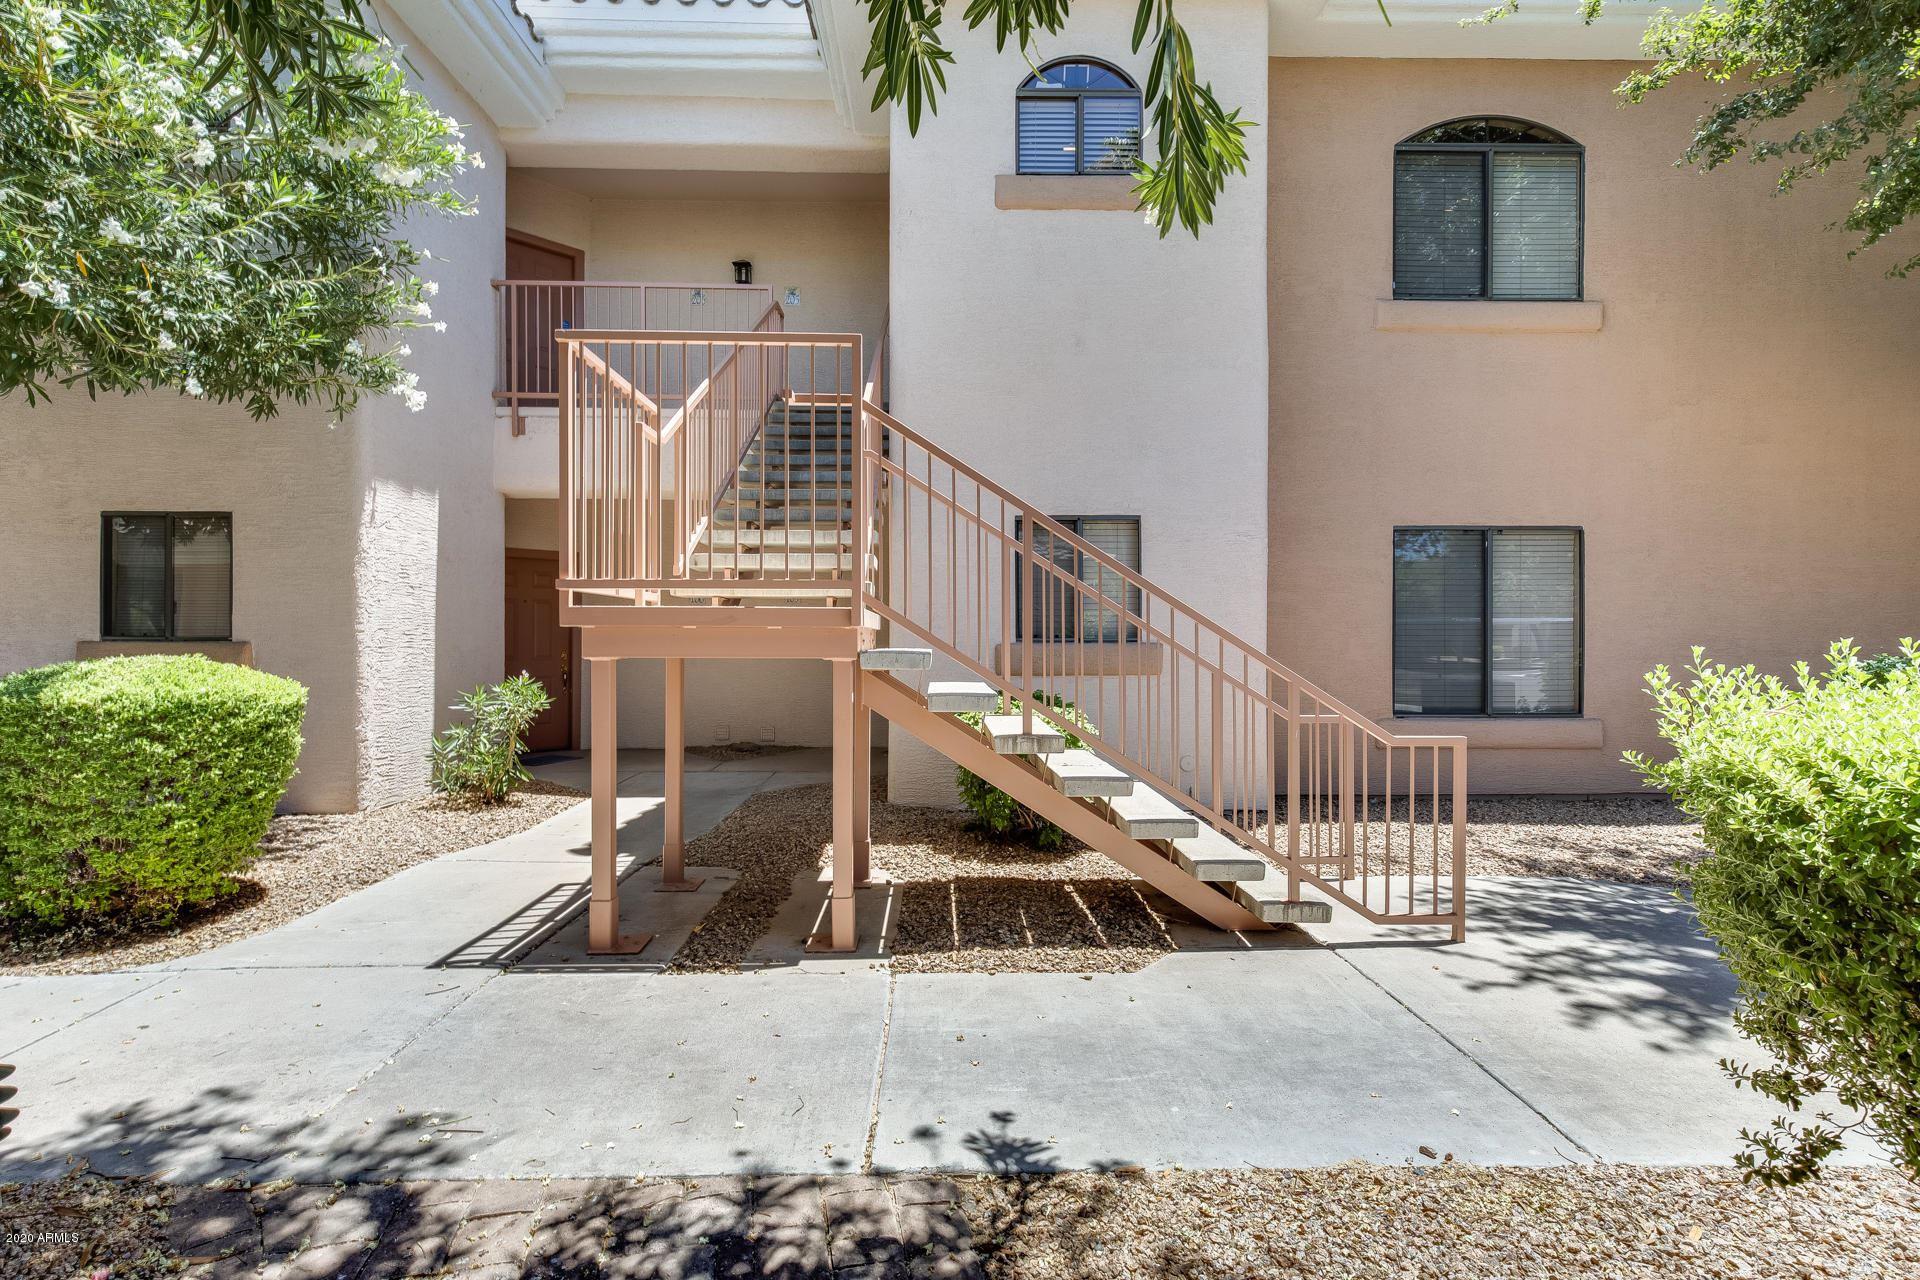 10030 W INDIAN SCHOOL Road #206, Phoenix, AZ 85037 - MLS#: 6092190